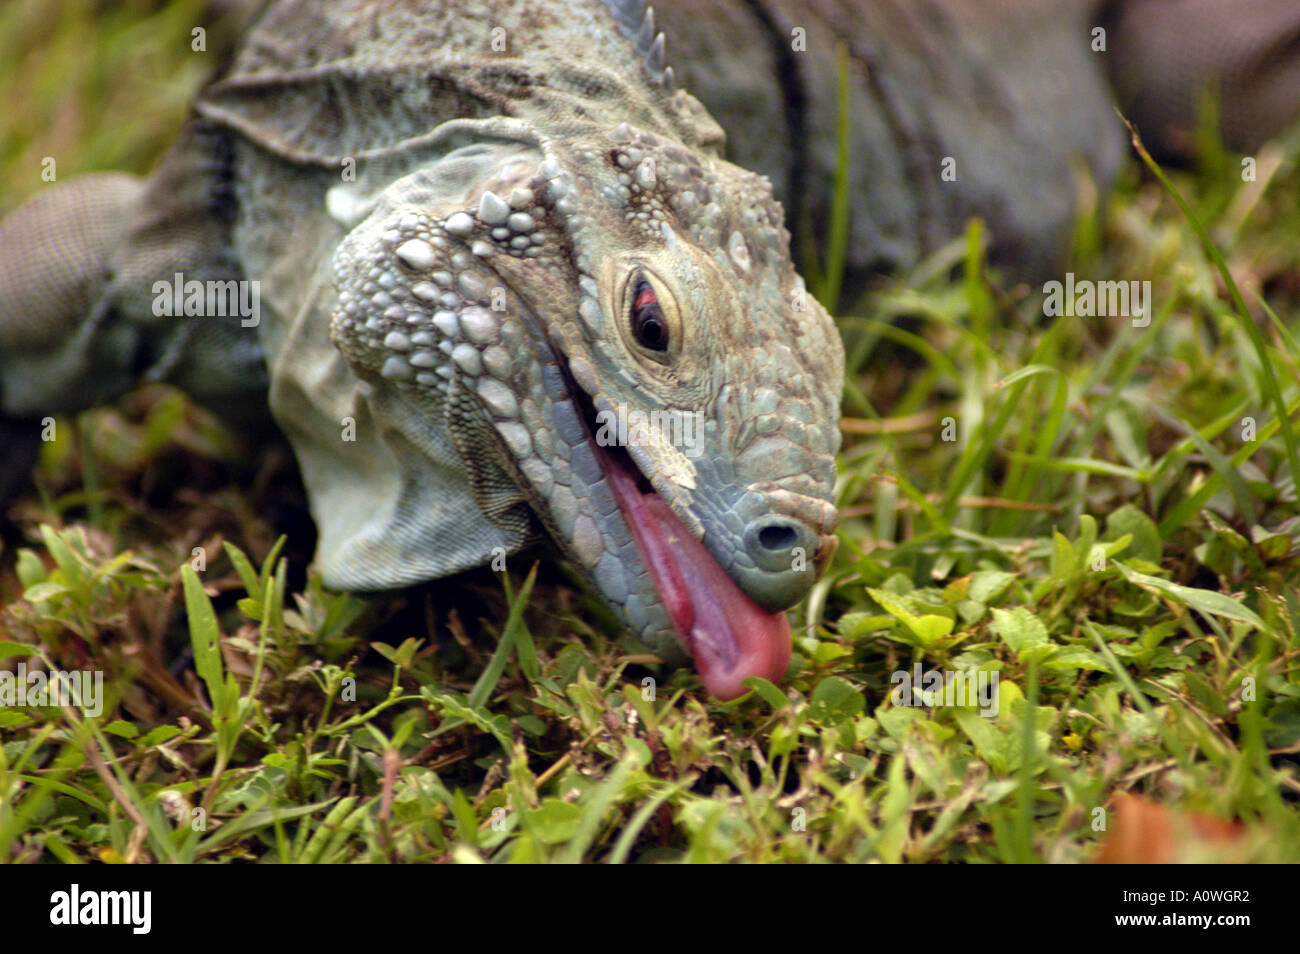 Caribbean Animals: Cayman Islands Grand Cayman Blue Iguana Caribbean Animals